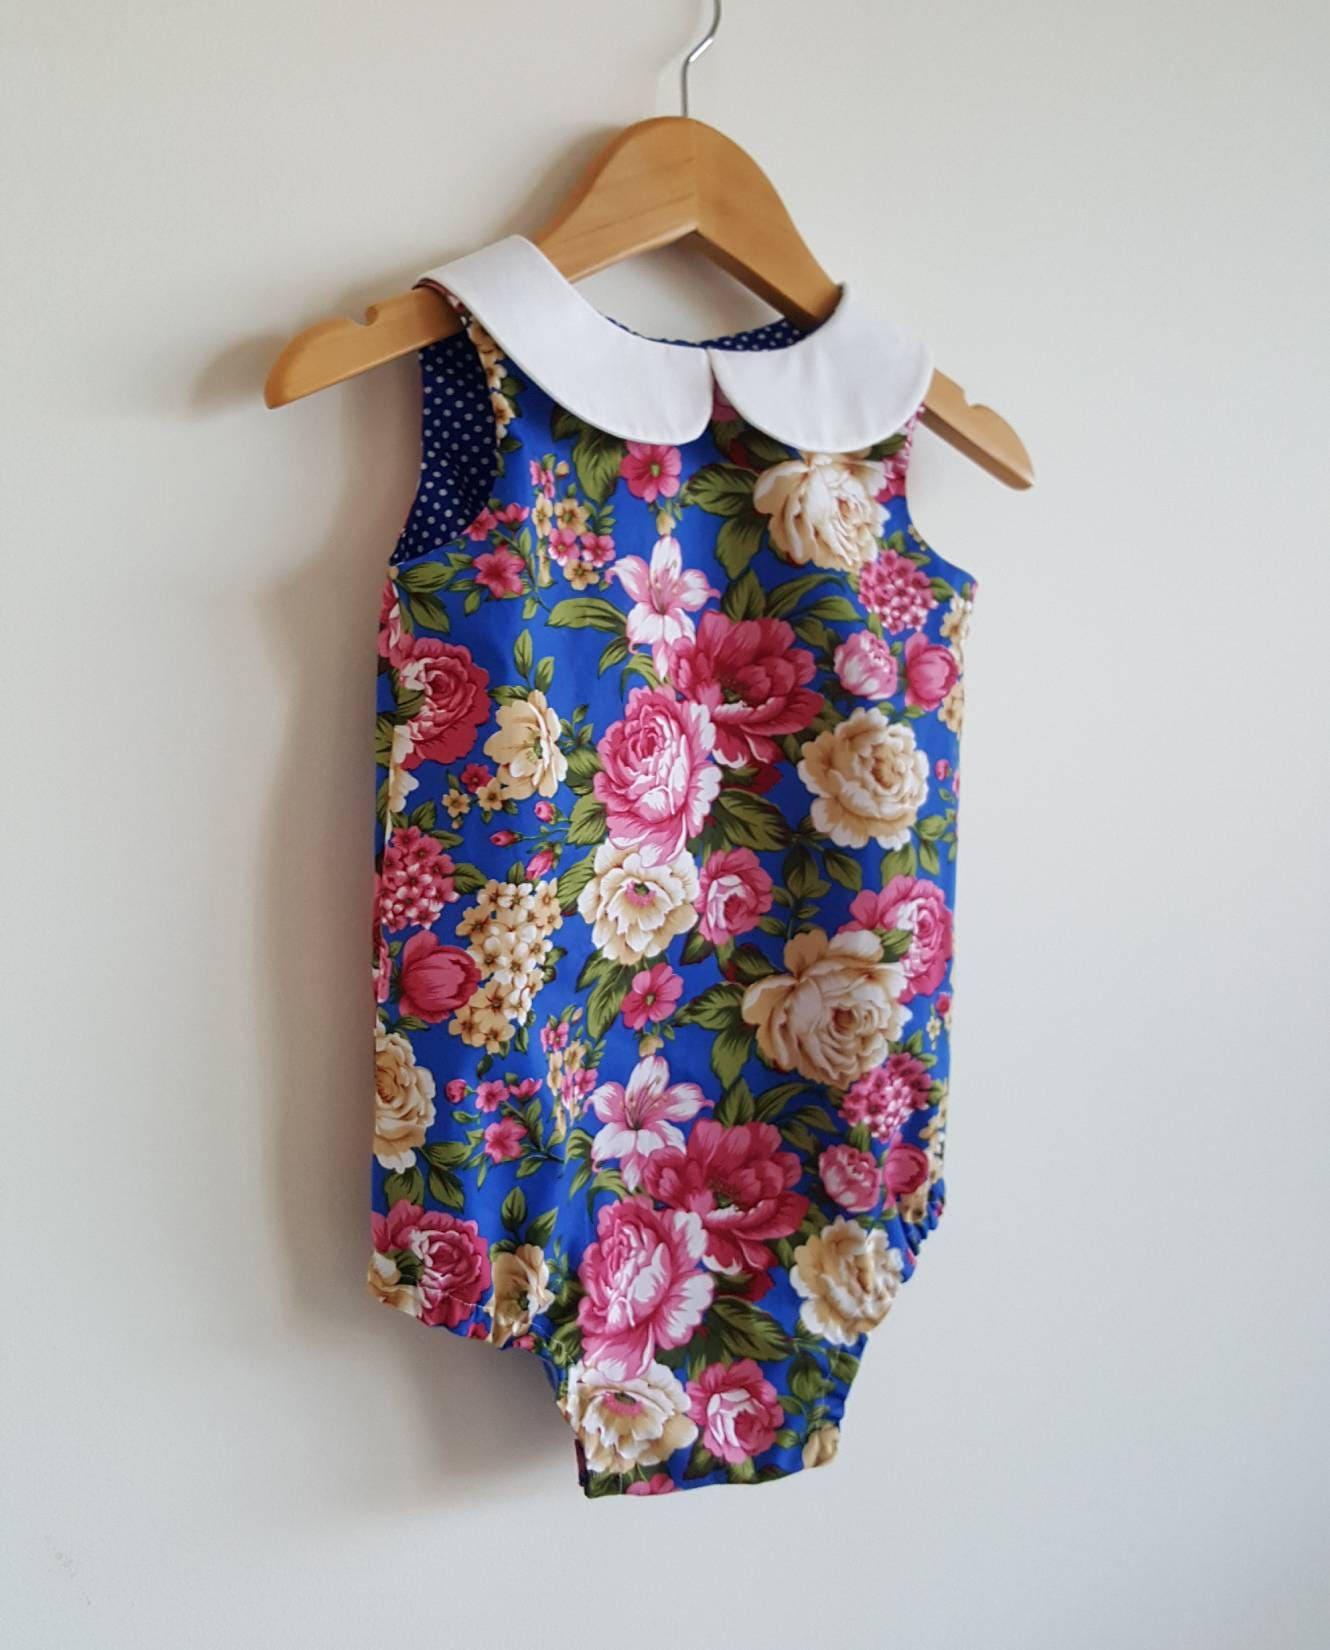 Baby girls playsuit peter pan collar romper blue pink